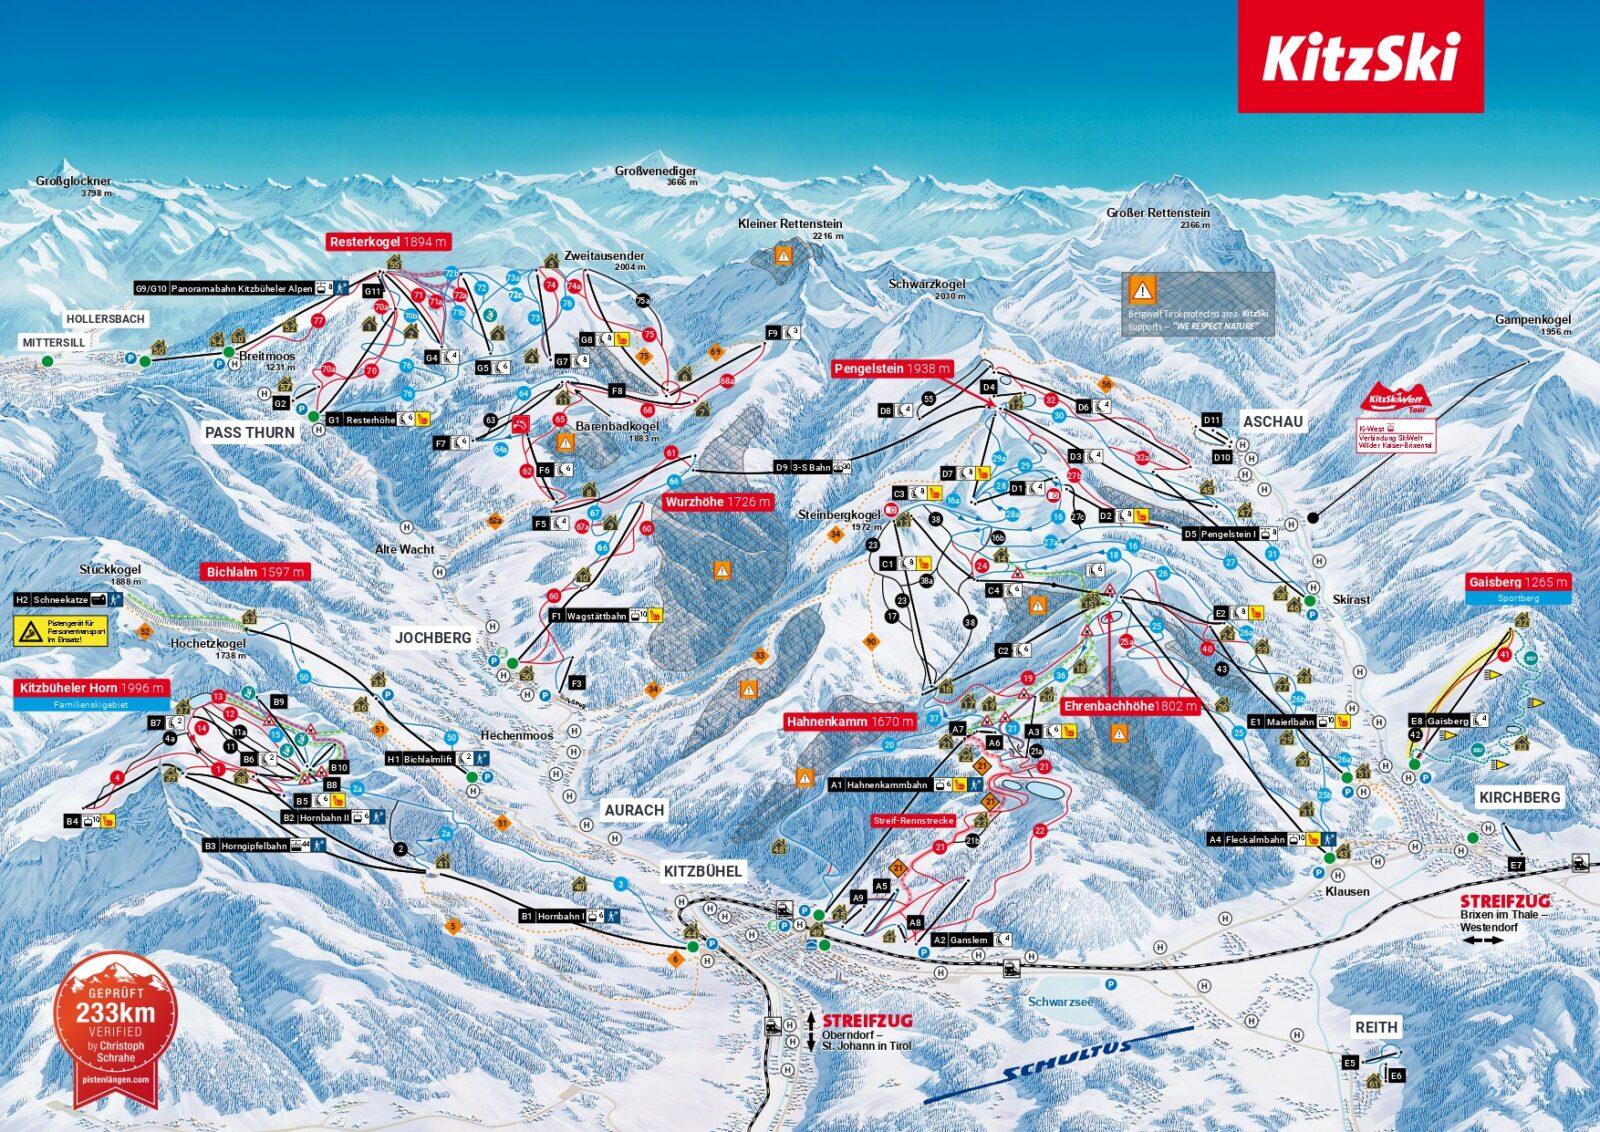 KitzSki Kitzbühel - Kirchberg map